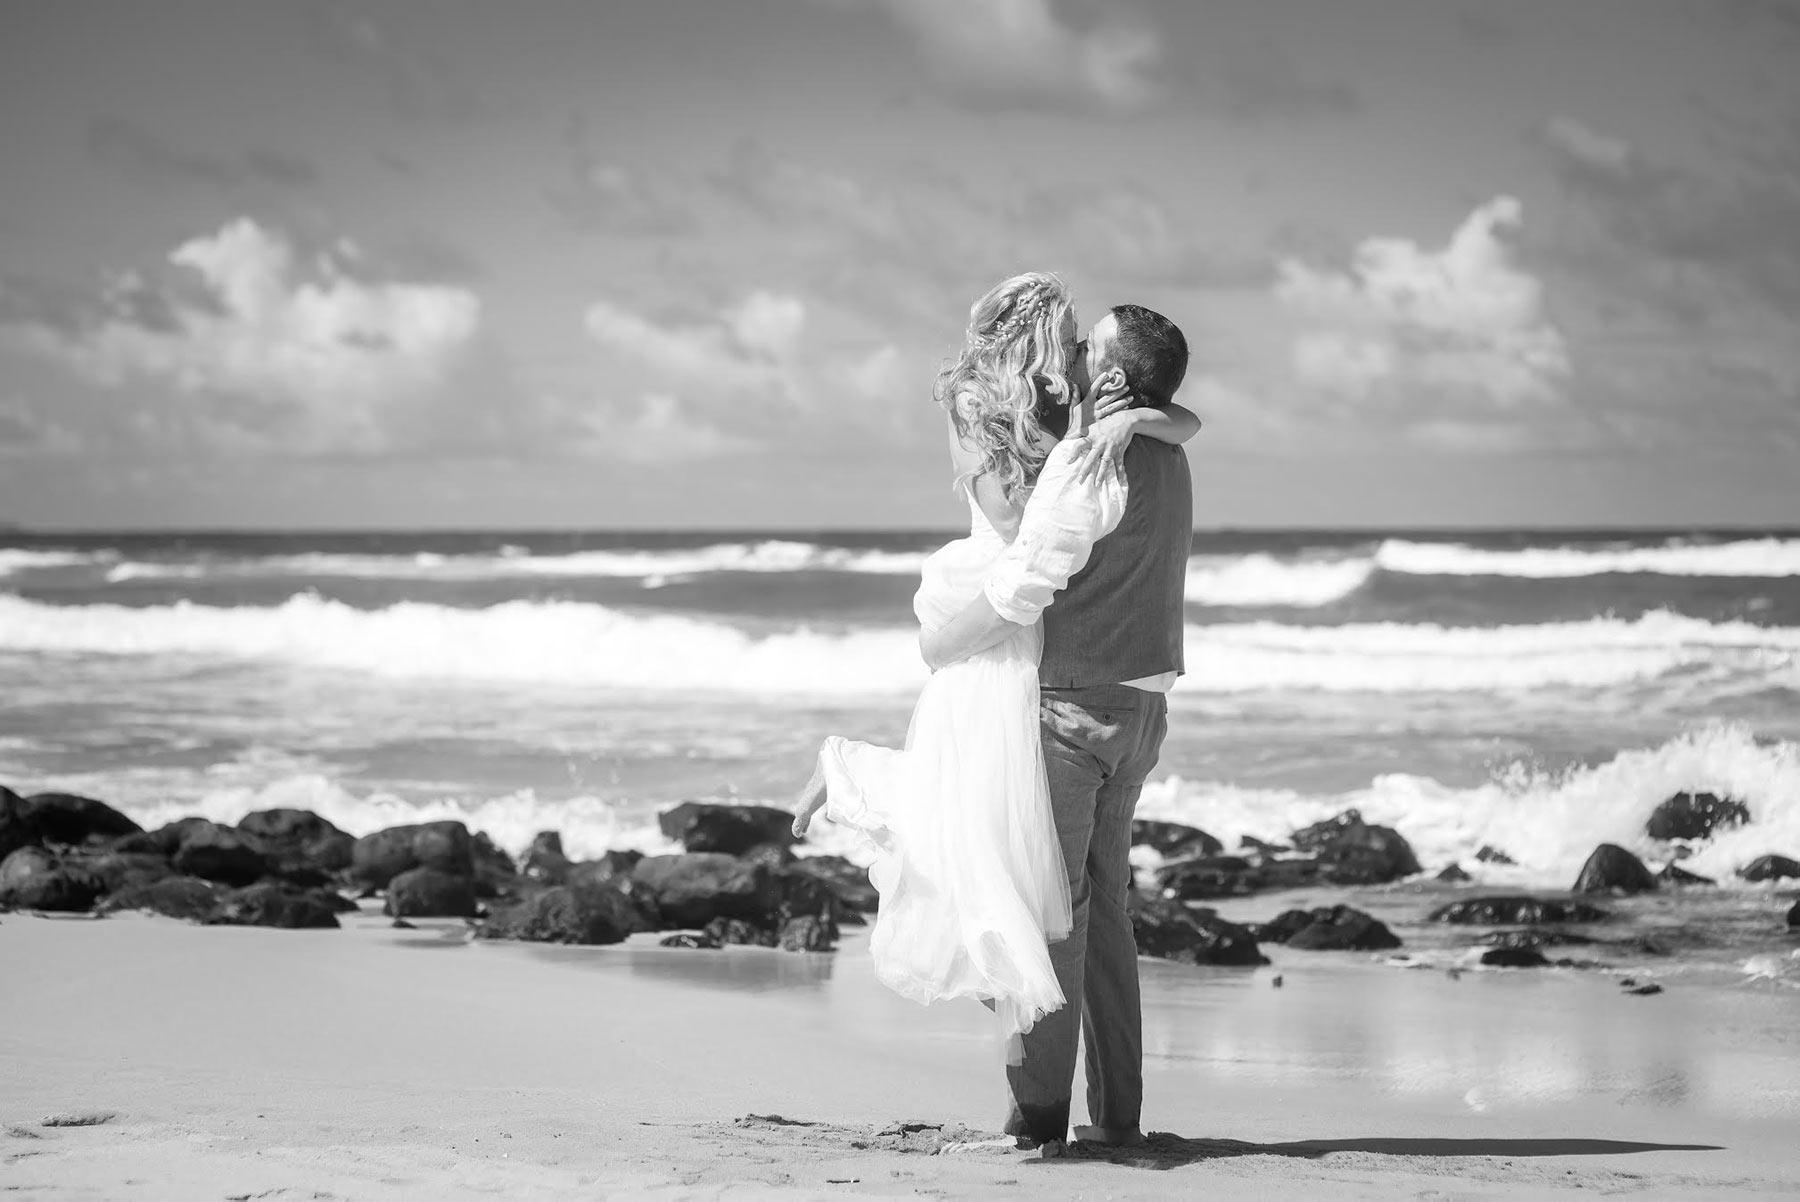 Bride and groom embrace after their wedding on Kauai.